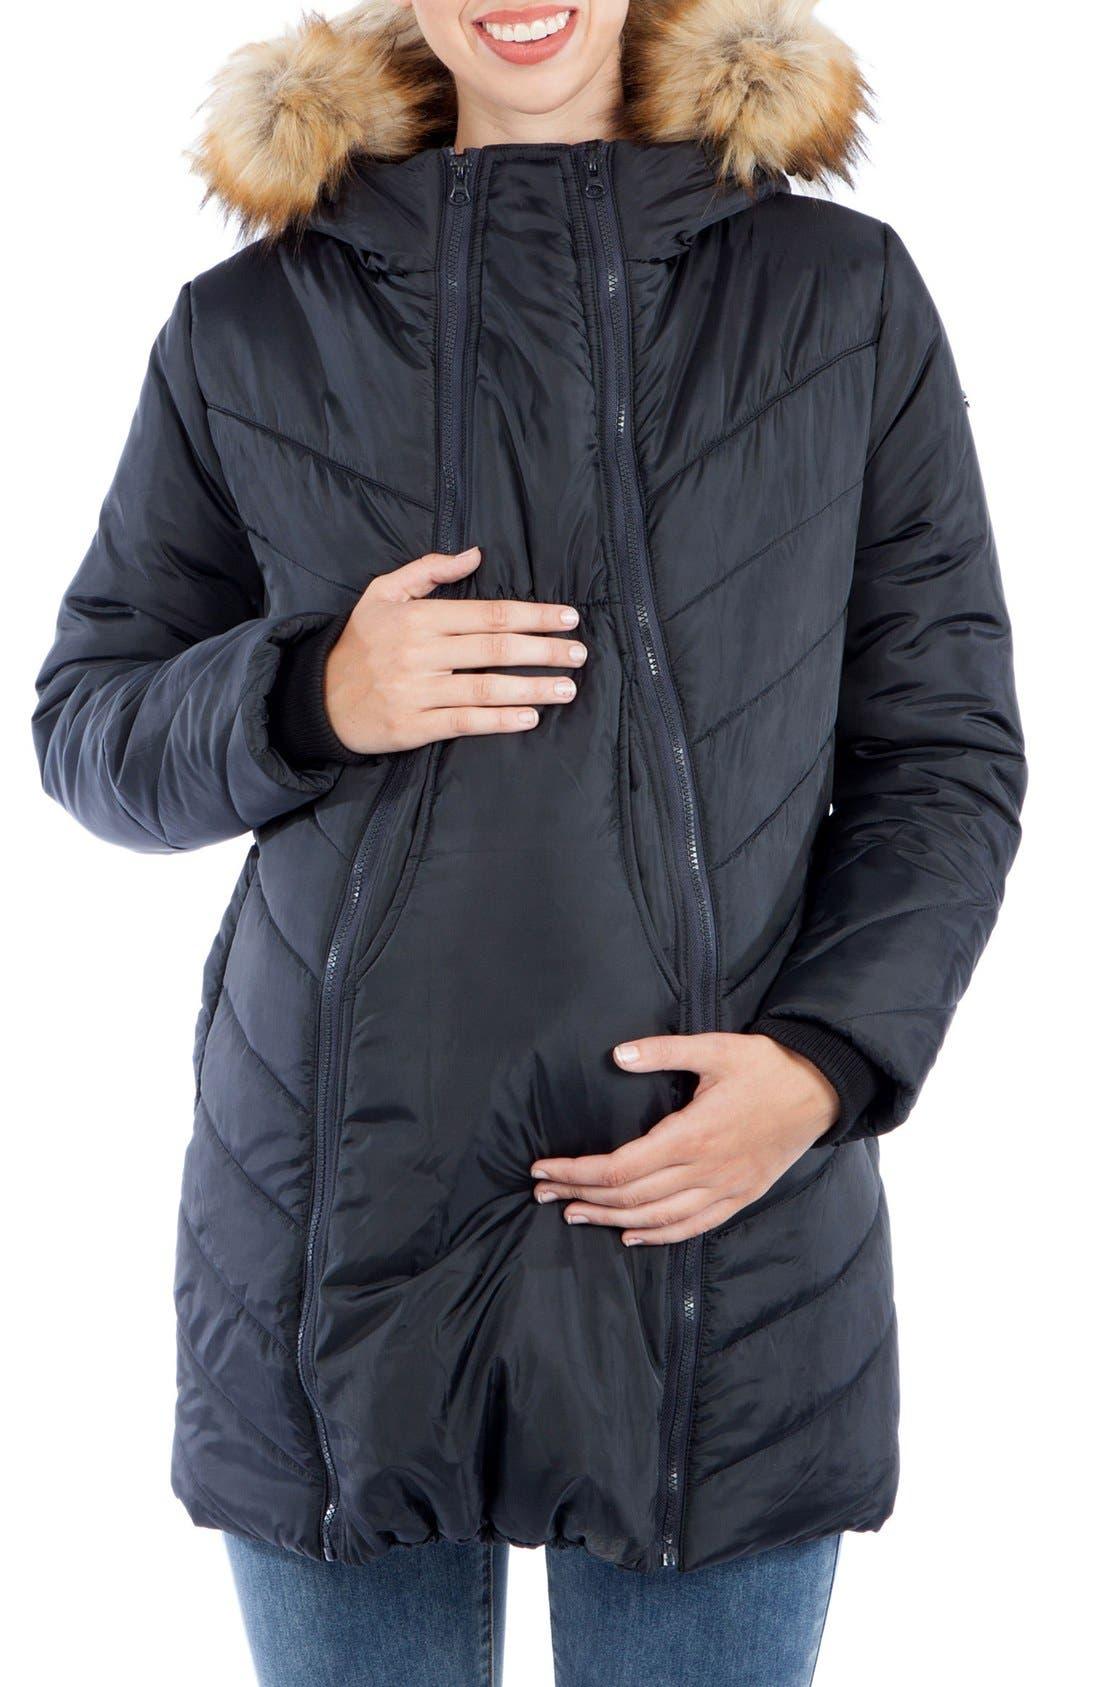 MODERN ETERNITY, Faux Fur Trim Convertible Puffer 3-in-1 Maternity Jacket, Alternate thumbnail 10, color, BLACK